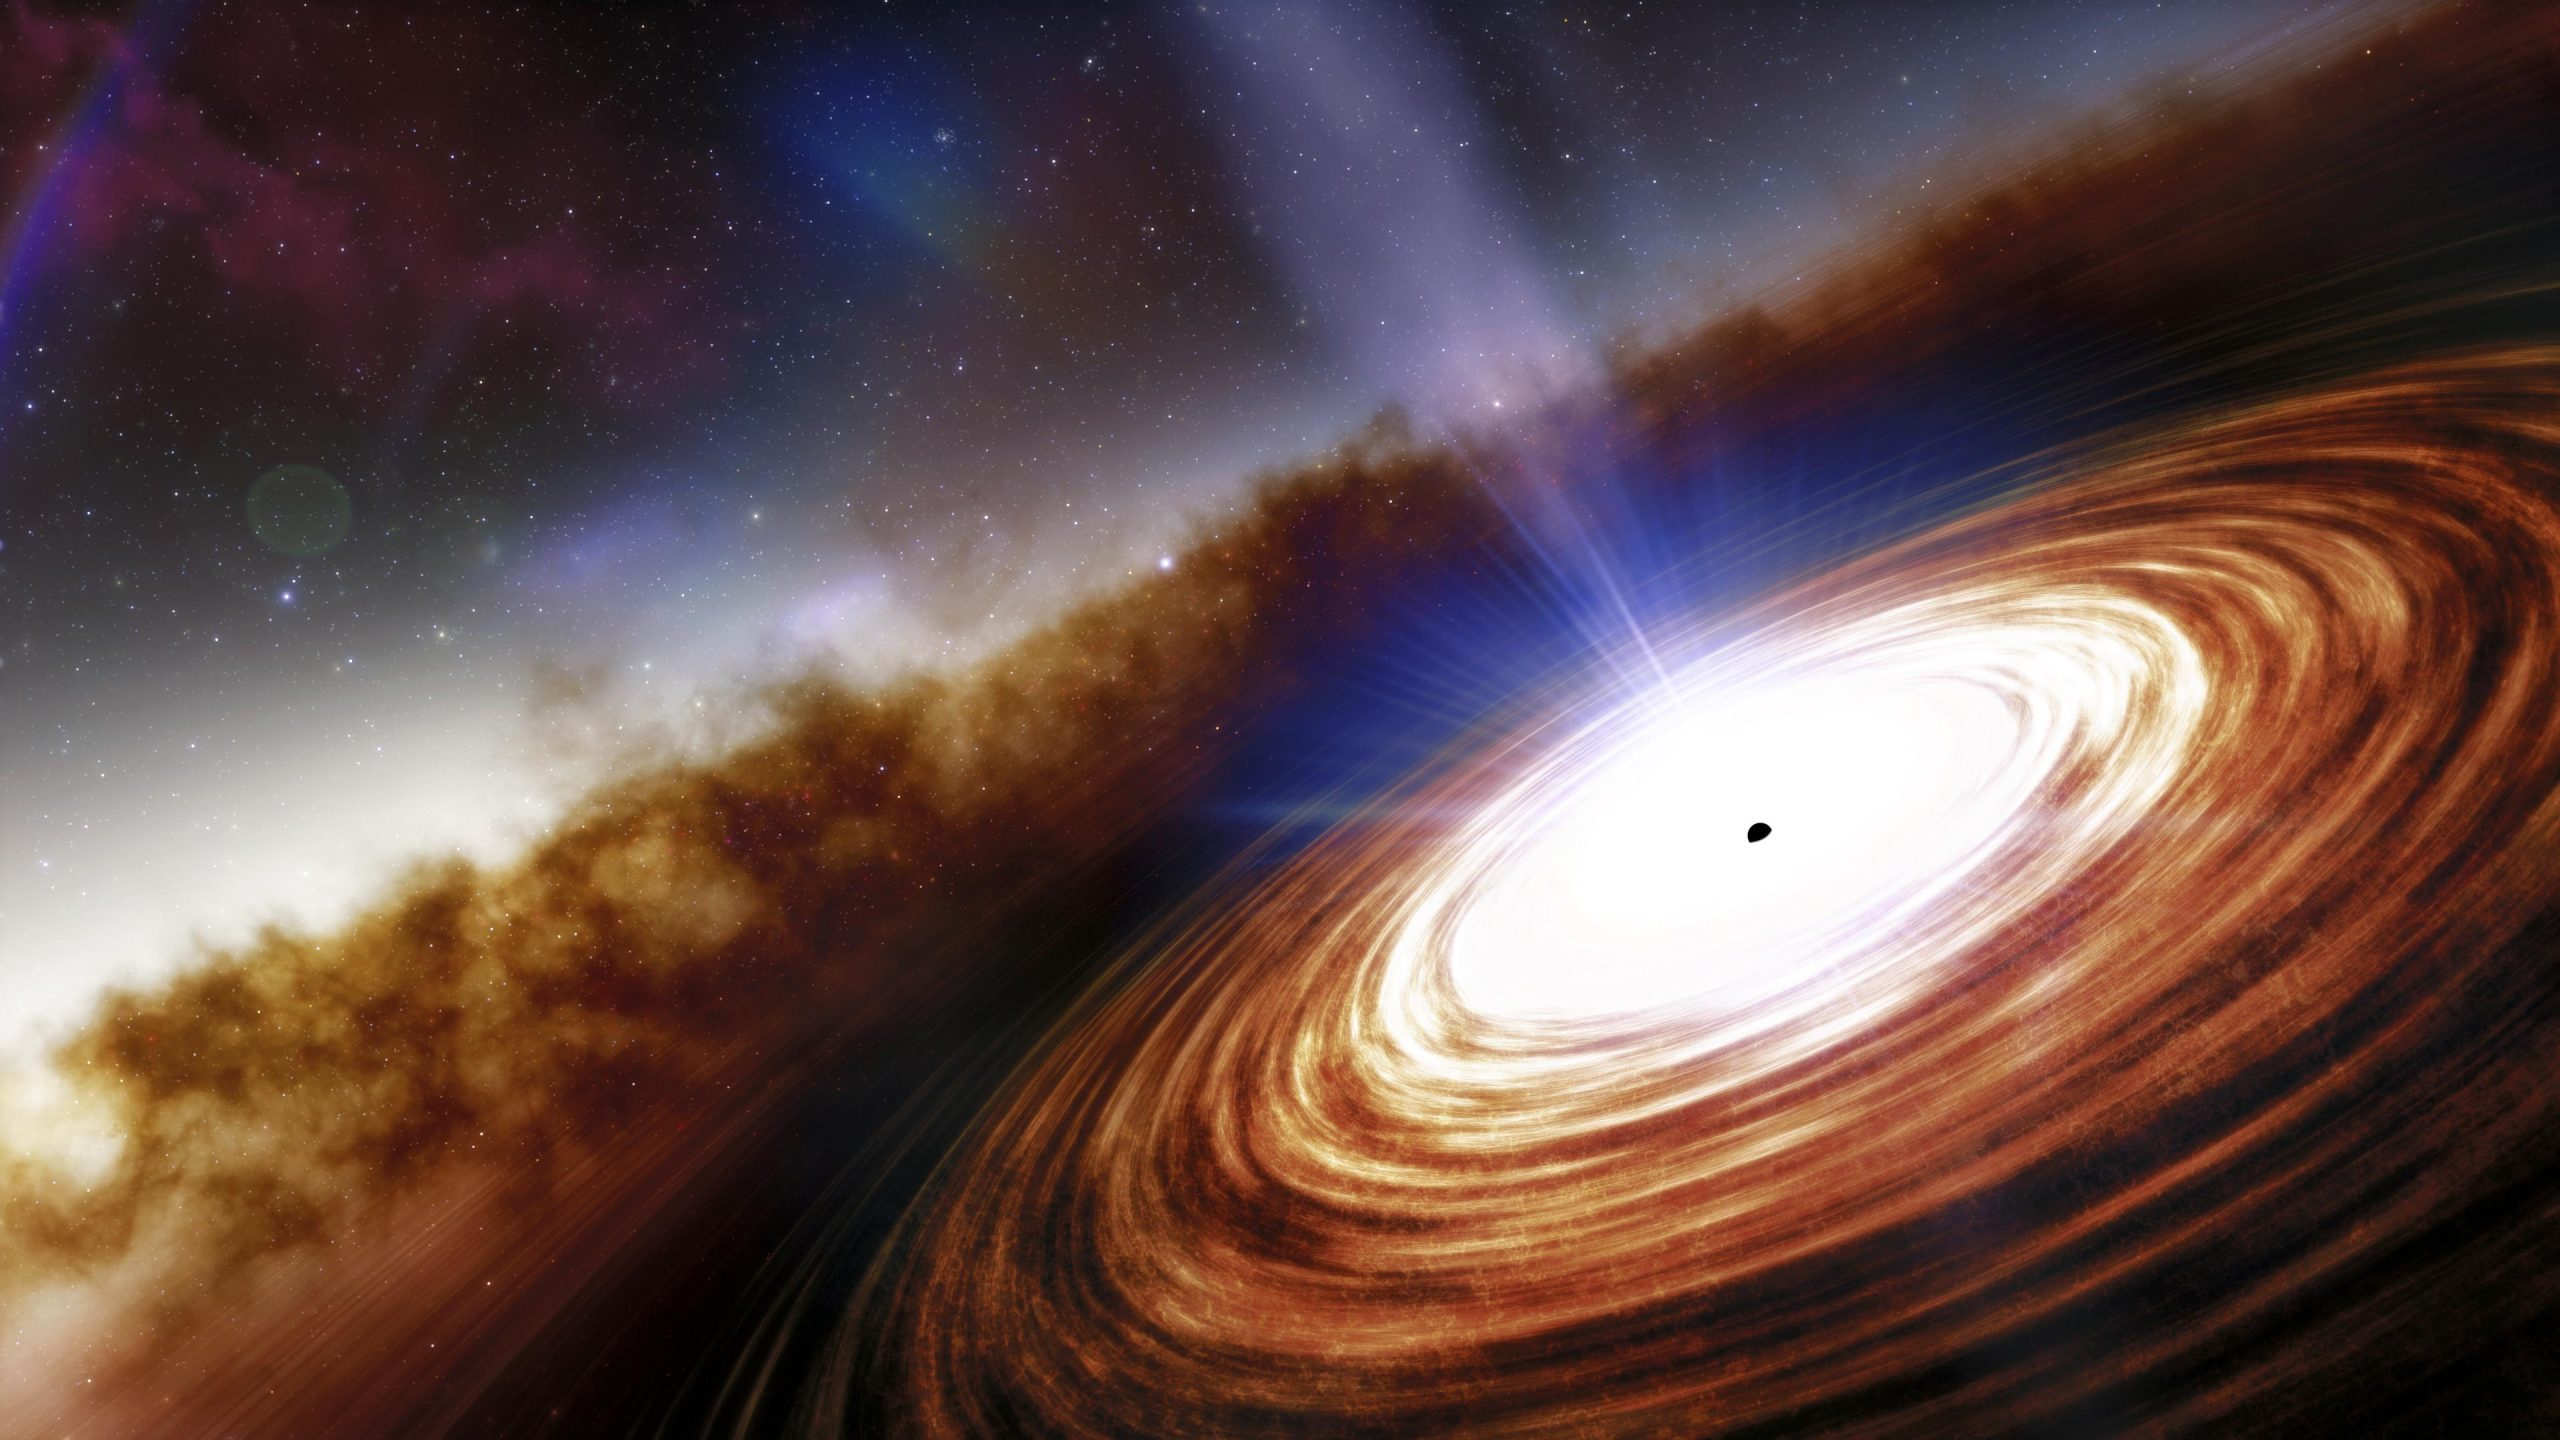 Quasar J scaled